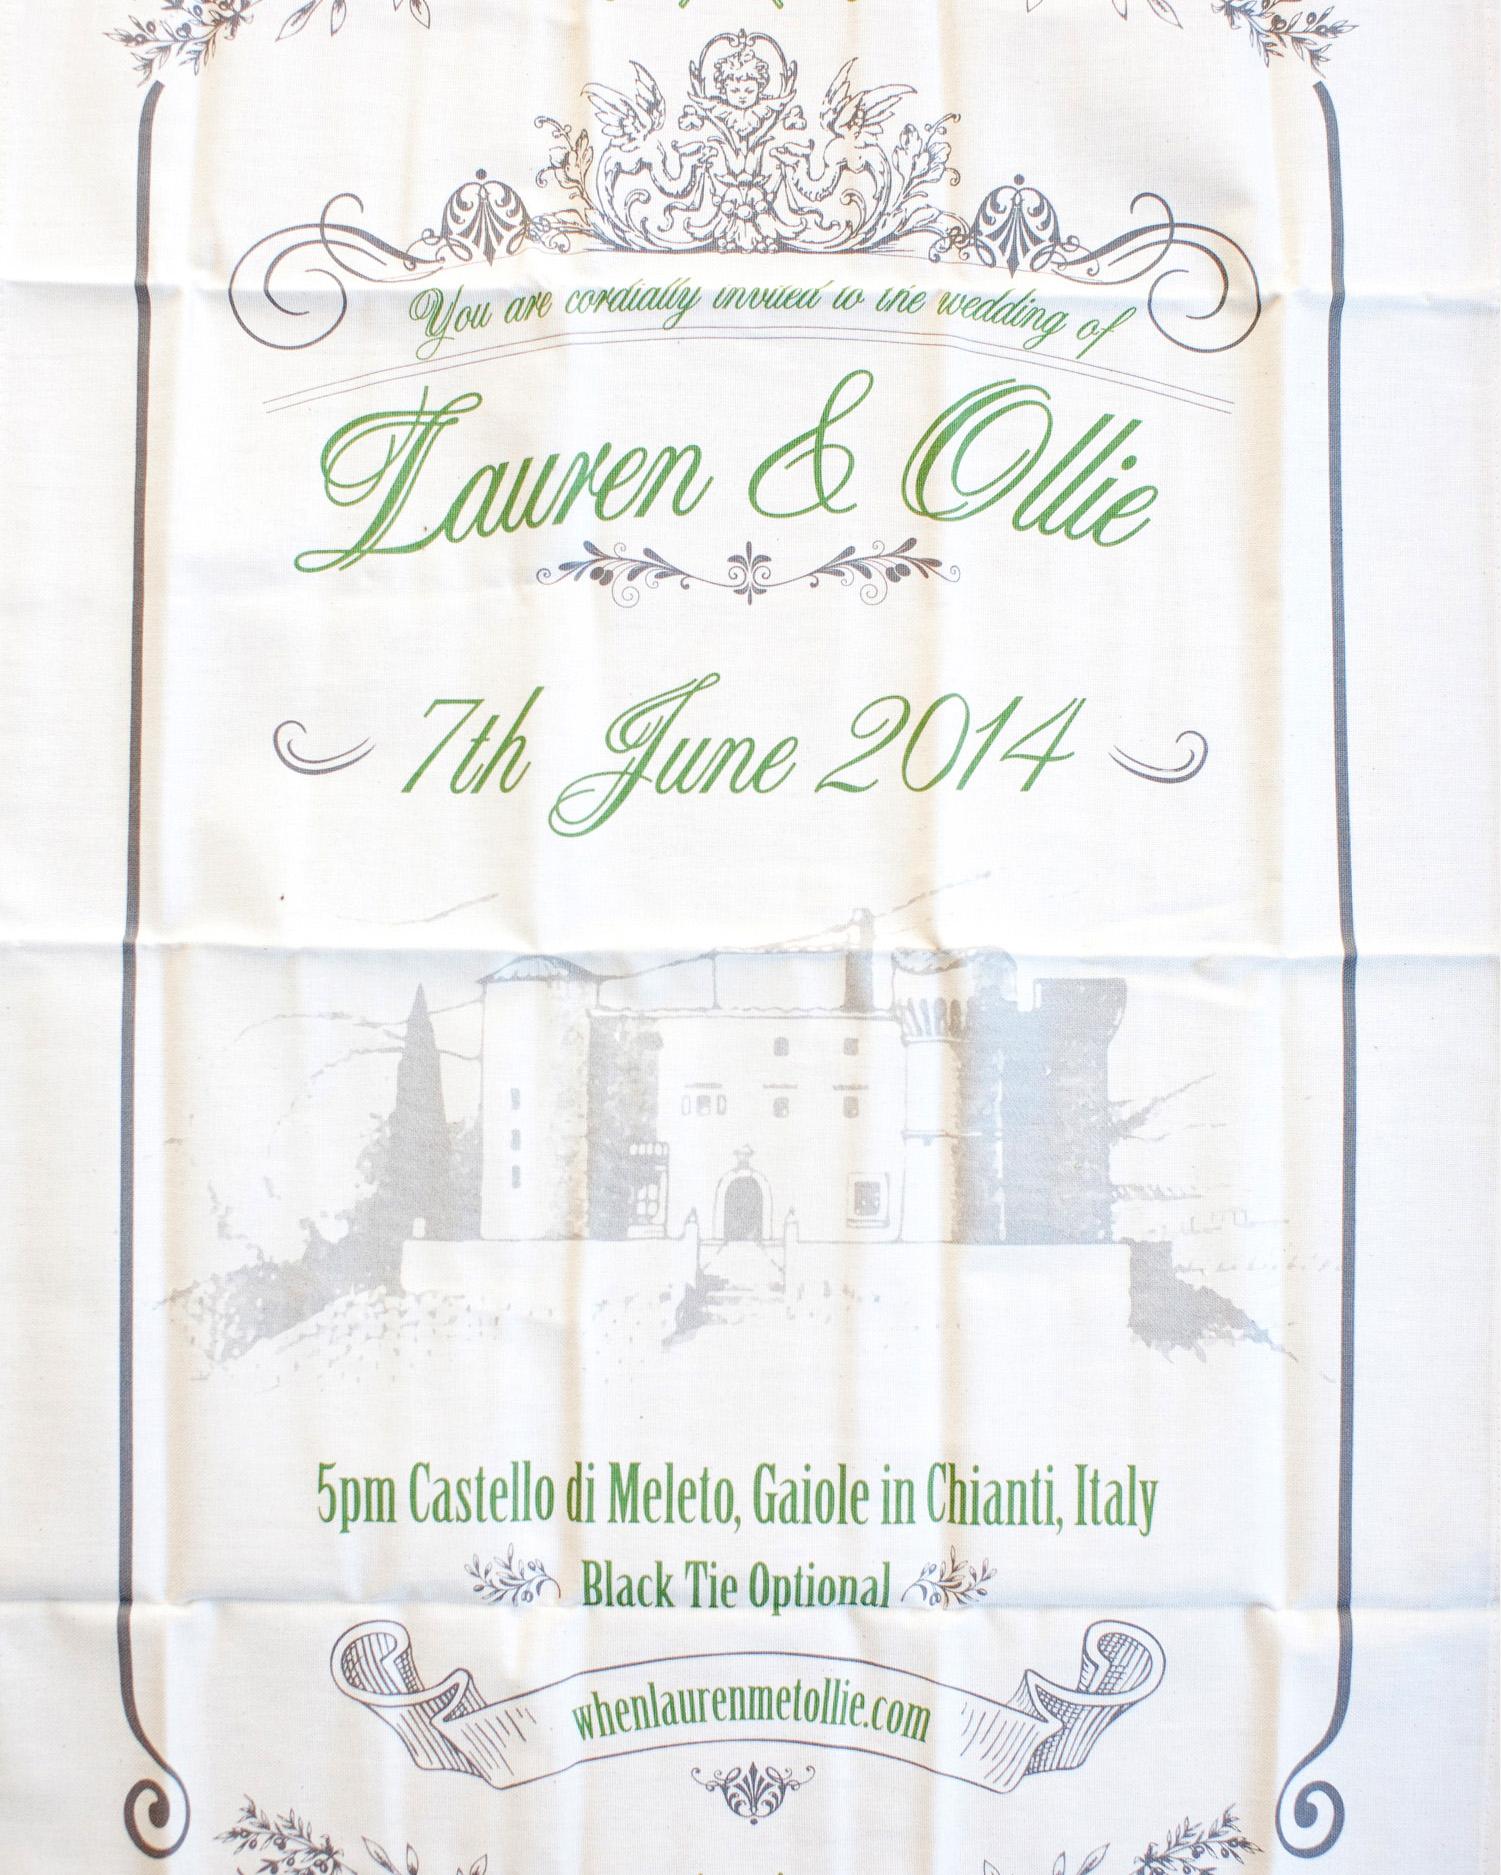 lauren-ollie-wedding-invitation-2-s111895-0515.jpg